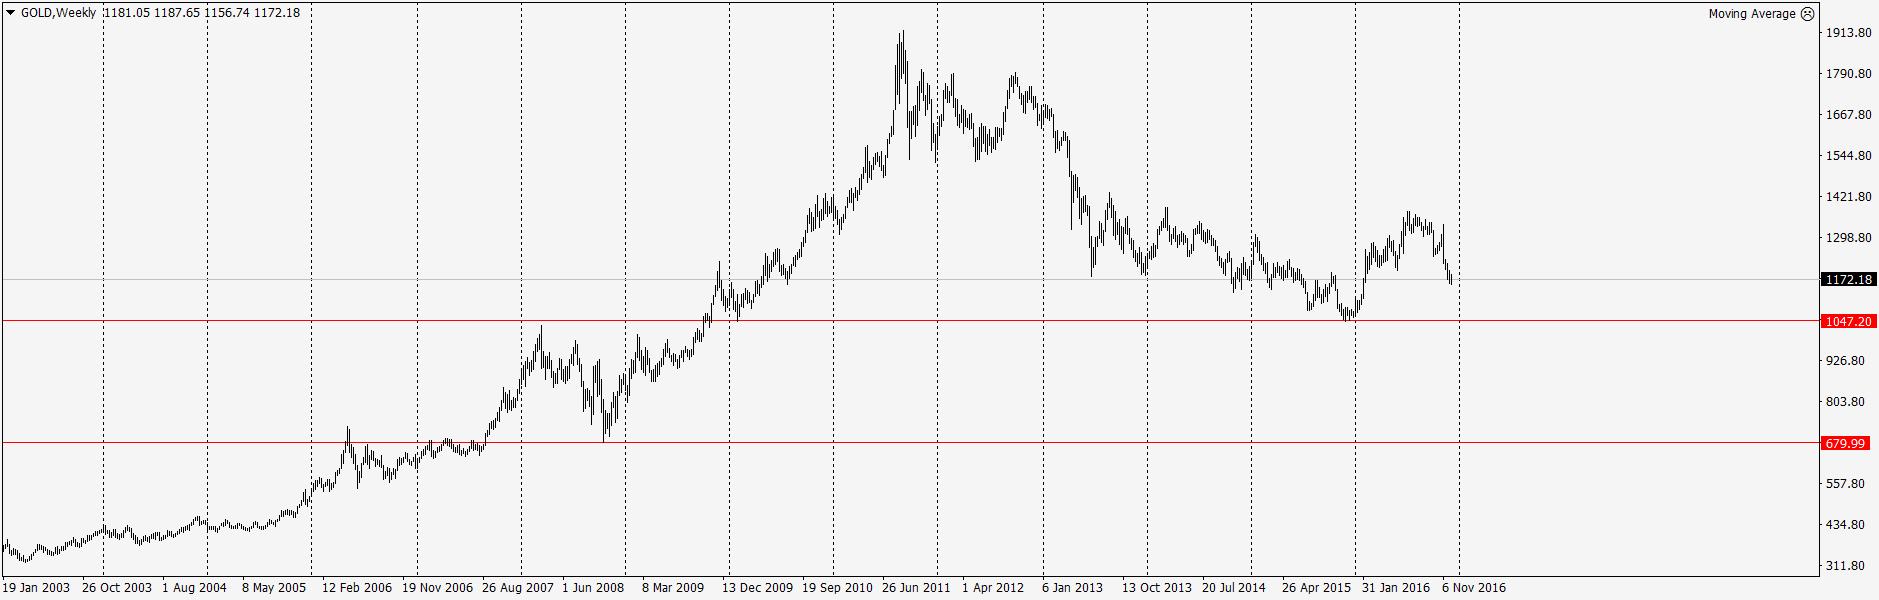 График роста золота Форекс